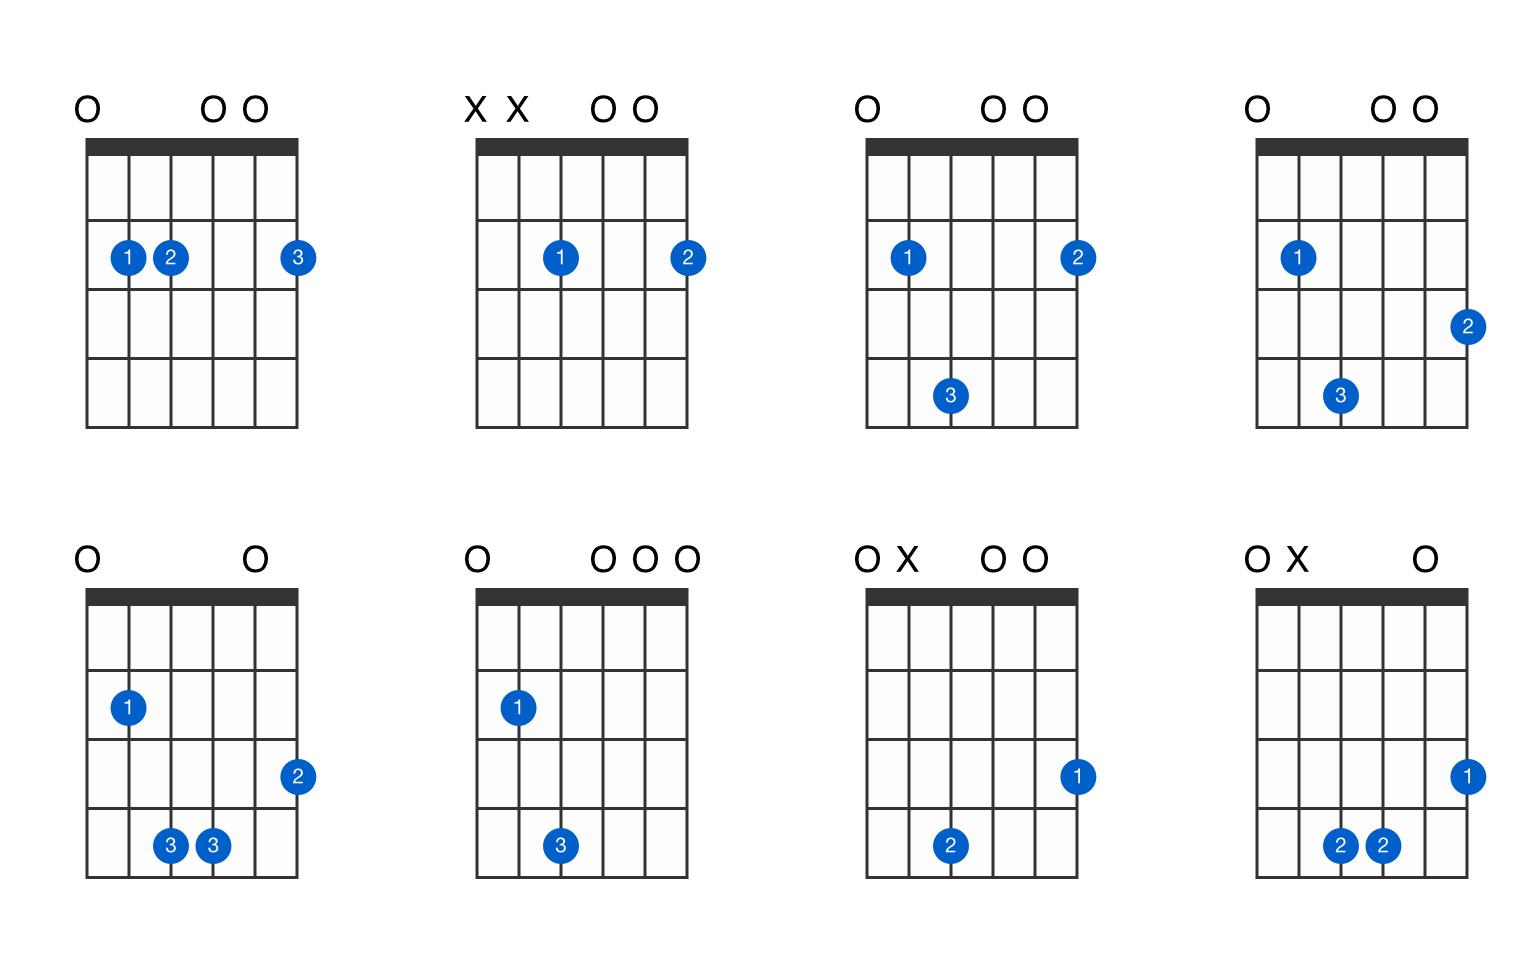 E minor add 15 guitar chord   GtrLib Chords